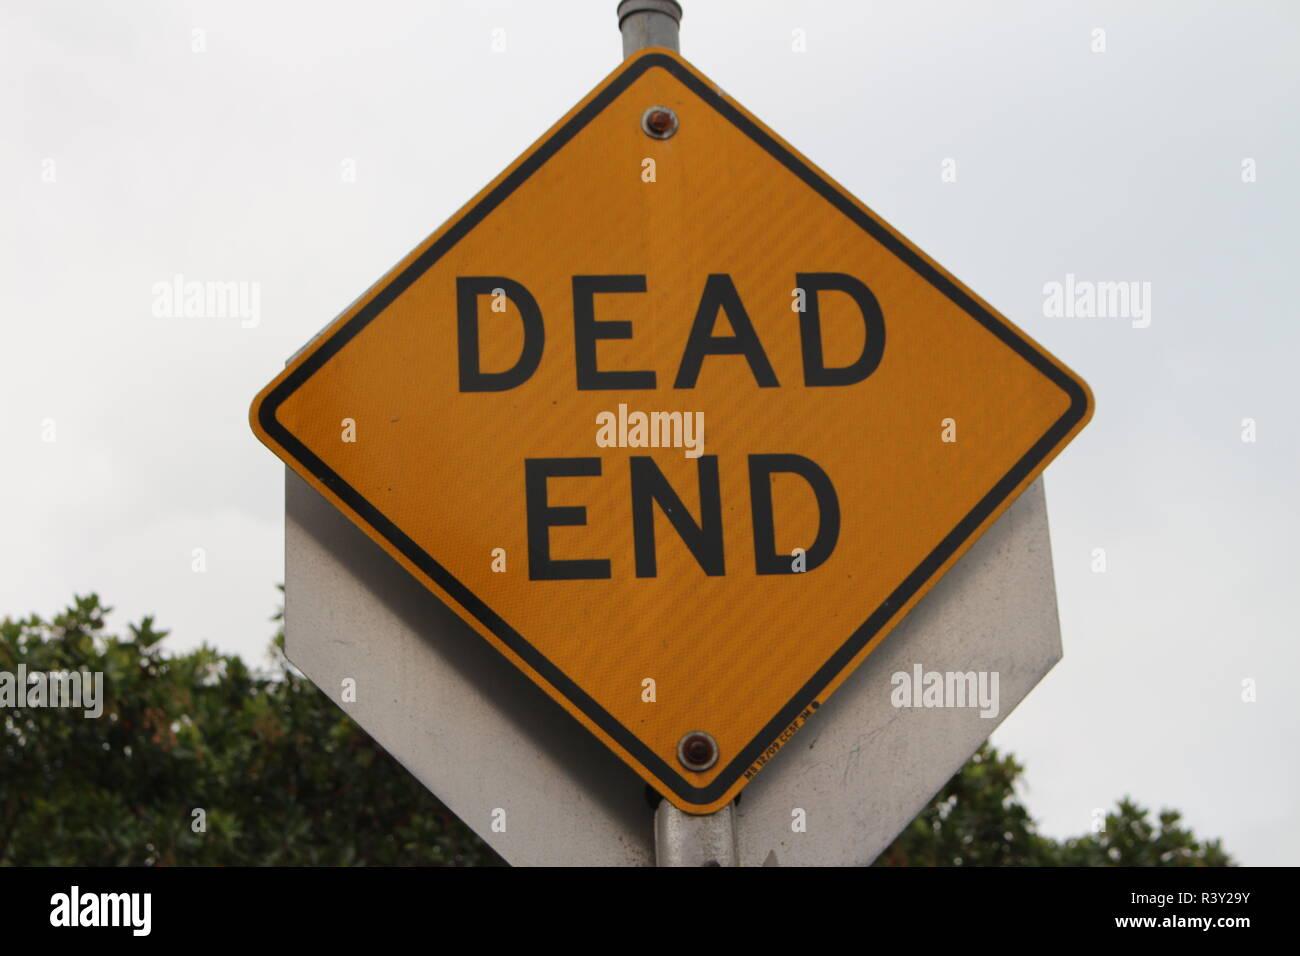 Dead End Verkehrsschild Zeichen Warnung USA - Stock Image